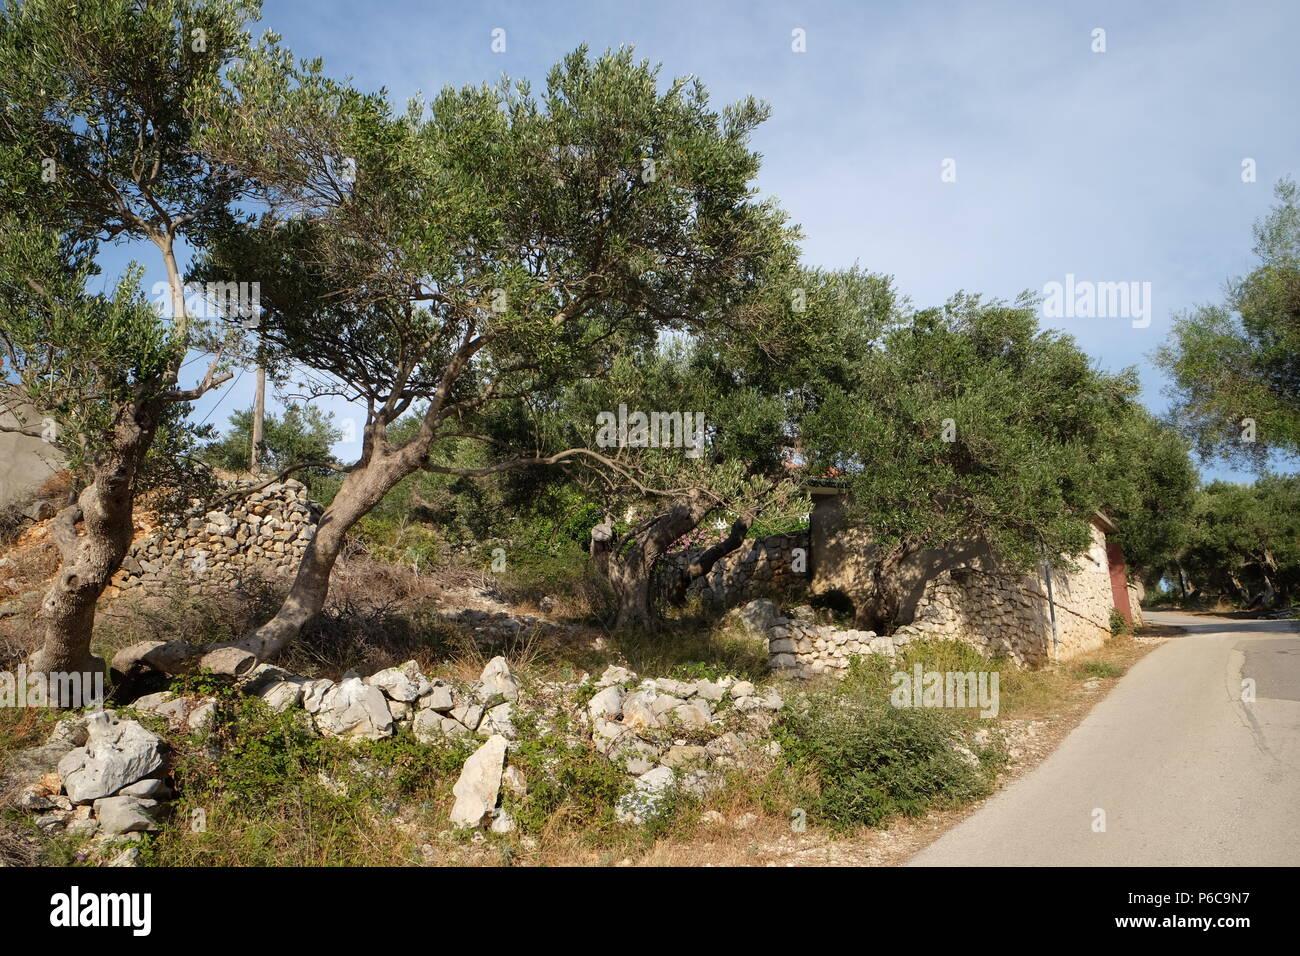 Olive Tree Island Pag Croatia Stock Photos & Olive Tree Island Pag ...